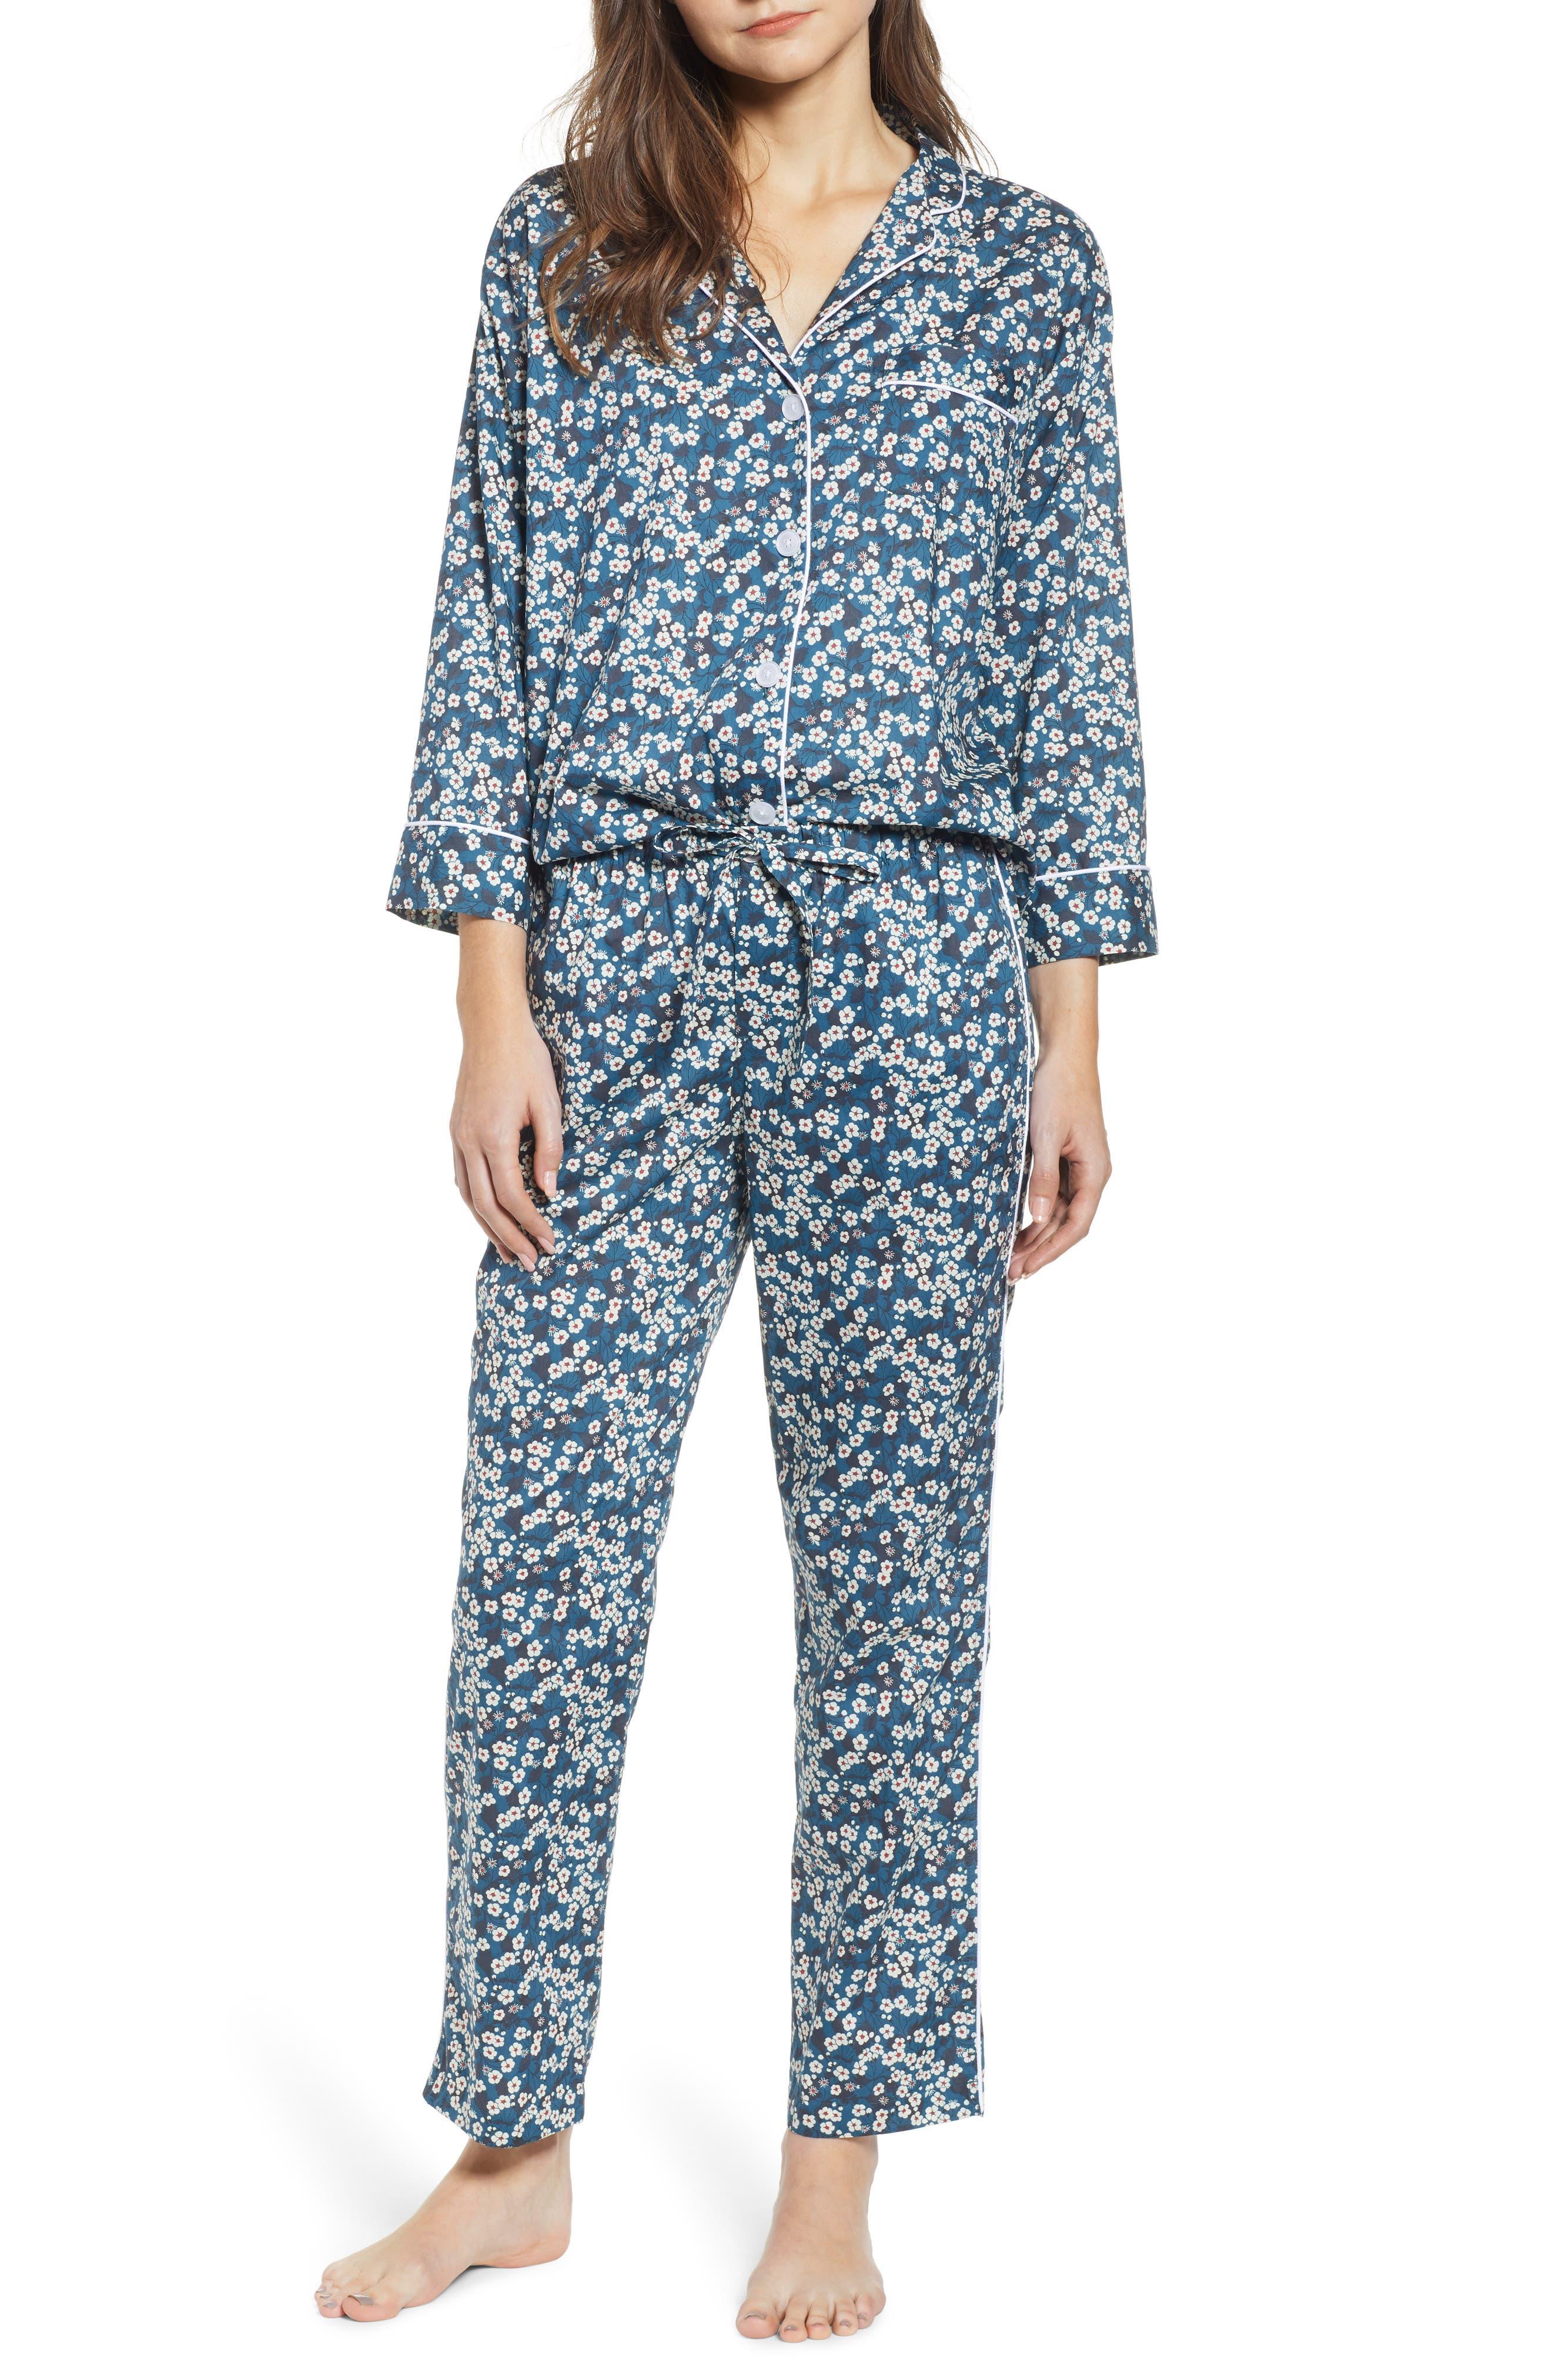 SLEEPY JONES Pajamas in Liberty Mitsy Wildflowers